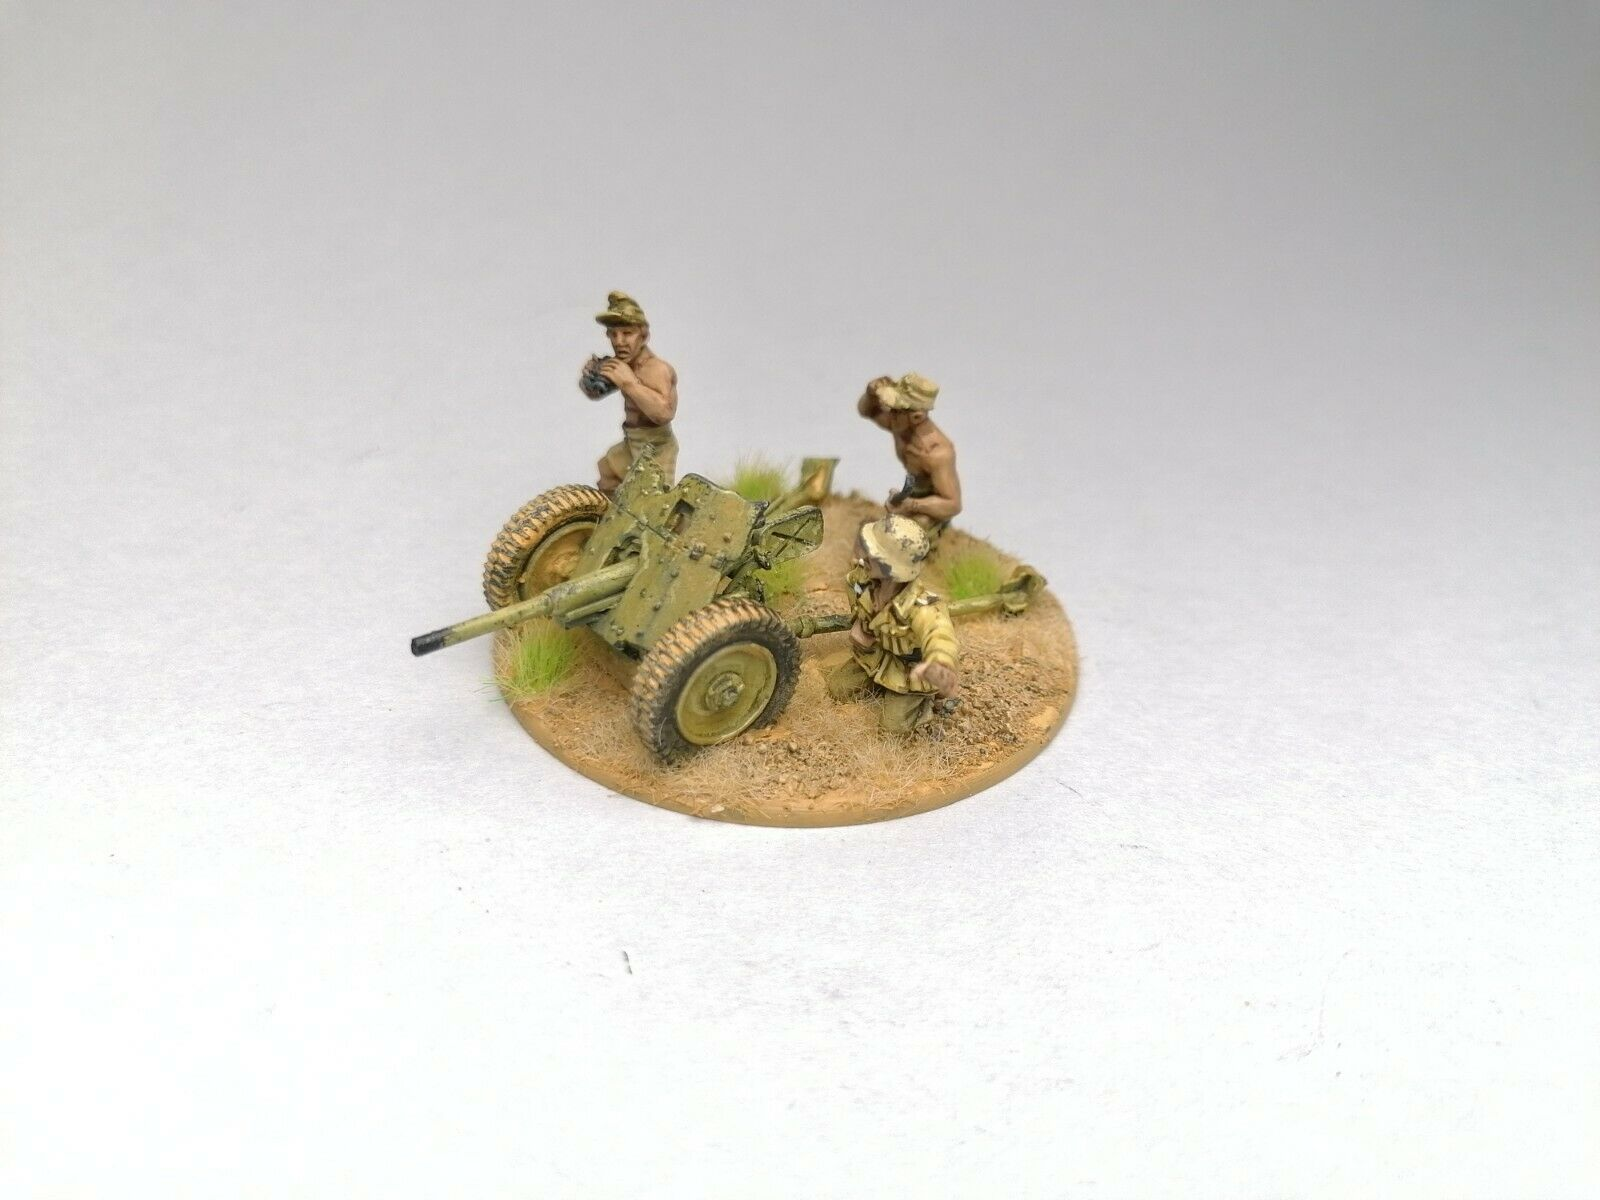 Tysk anti-tankpistol 3.7cm PaK 36 Afrika Korps WWW2 28mm Bolt Action Pro Payed